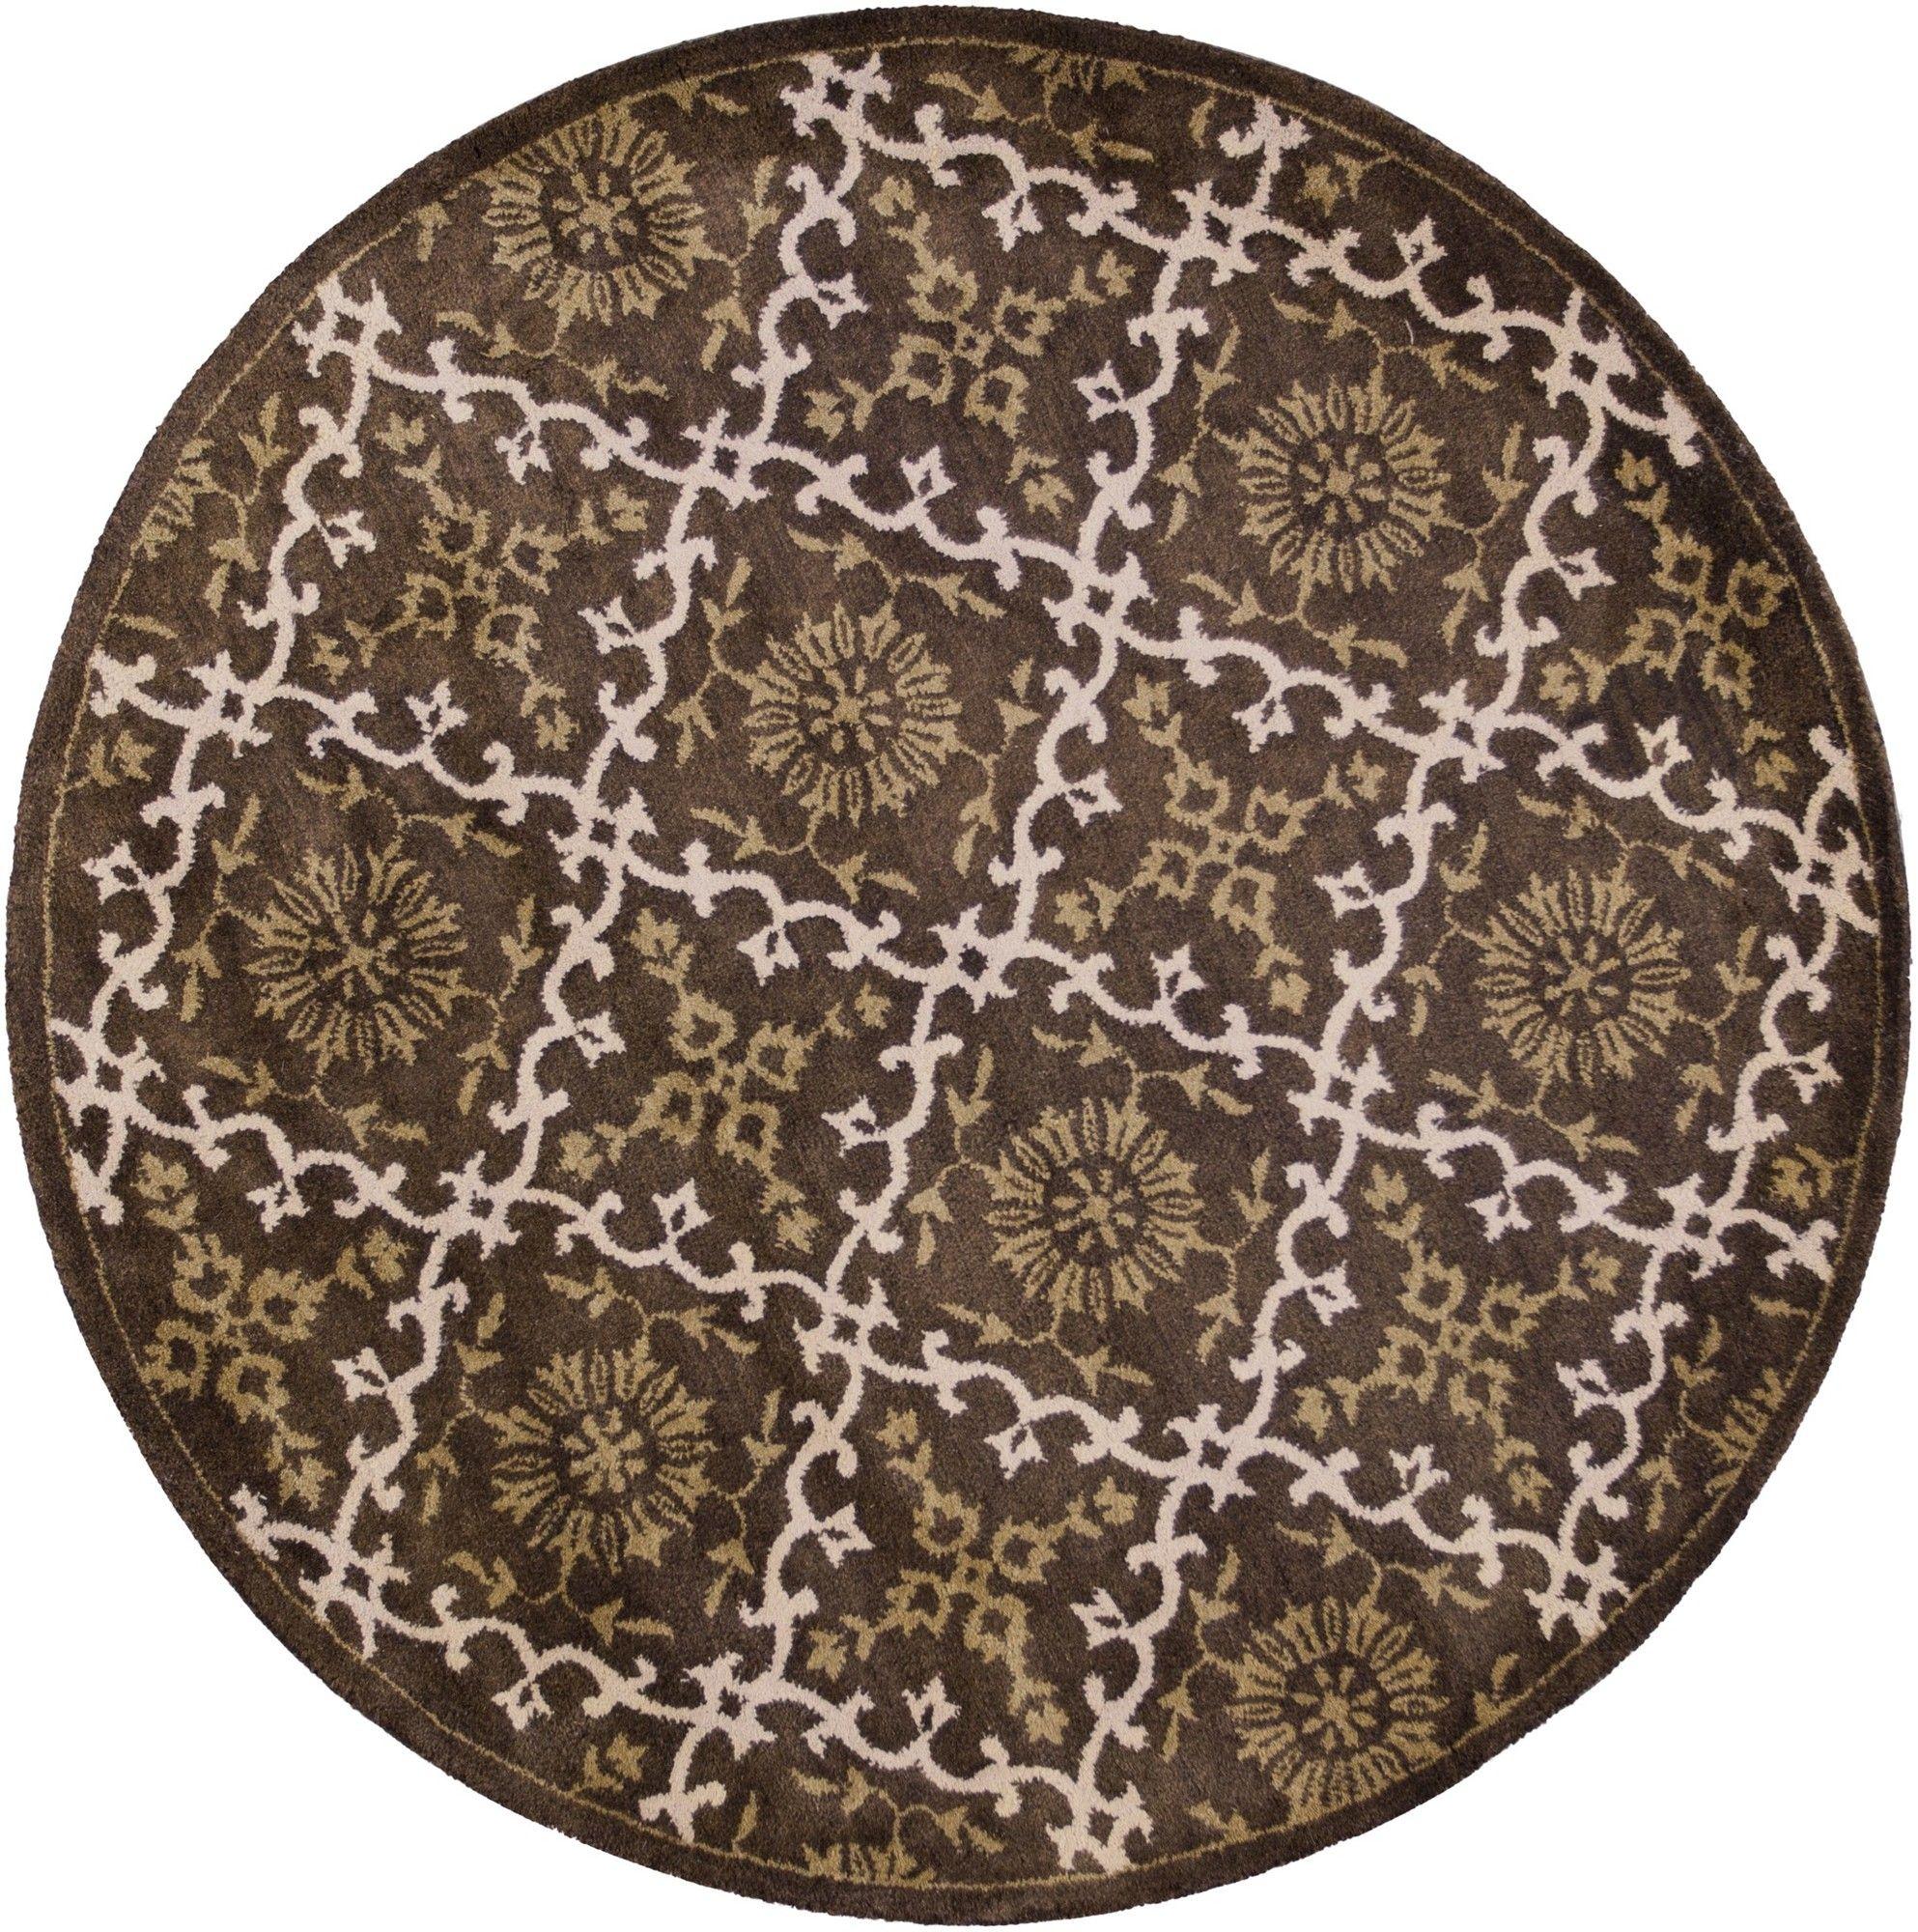 Balham Hand-Tufted Mocha Area Rug